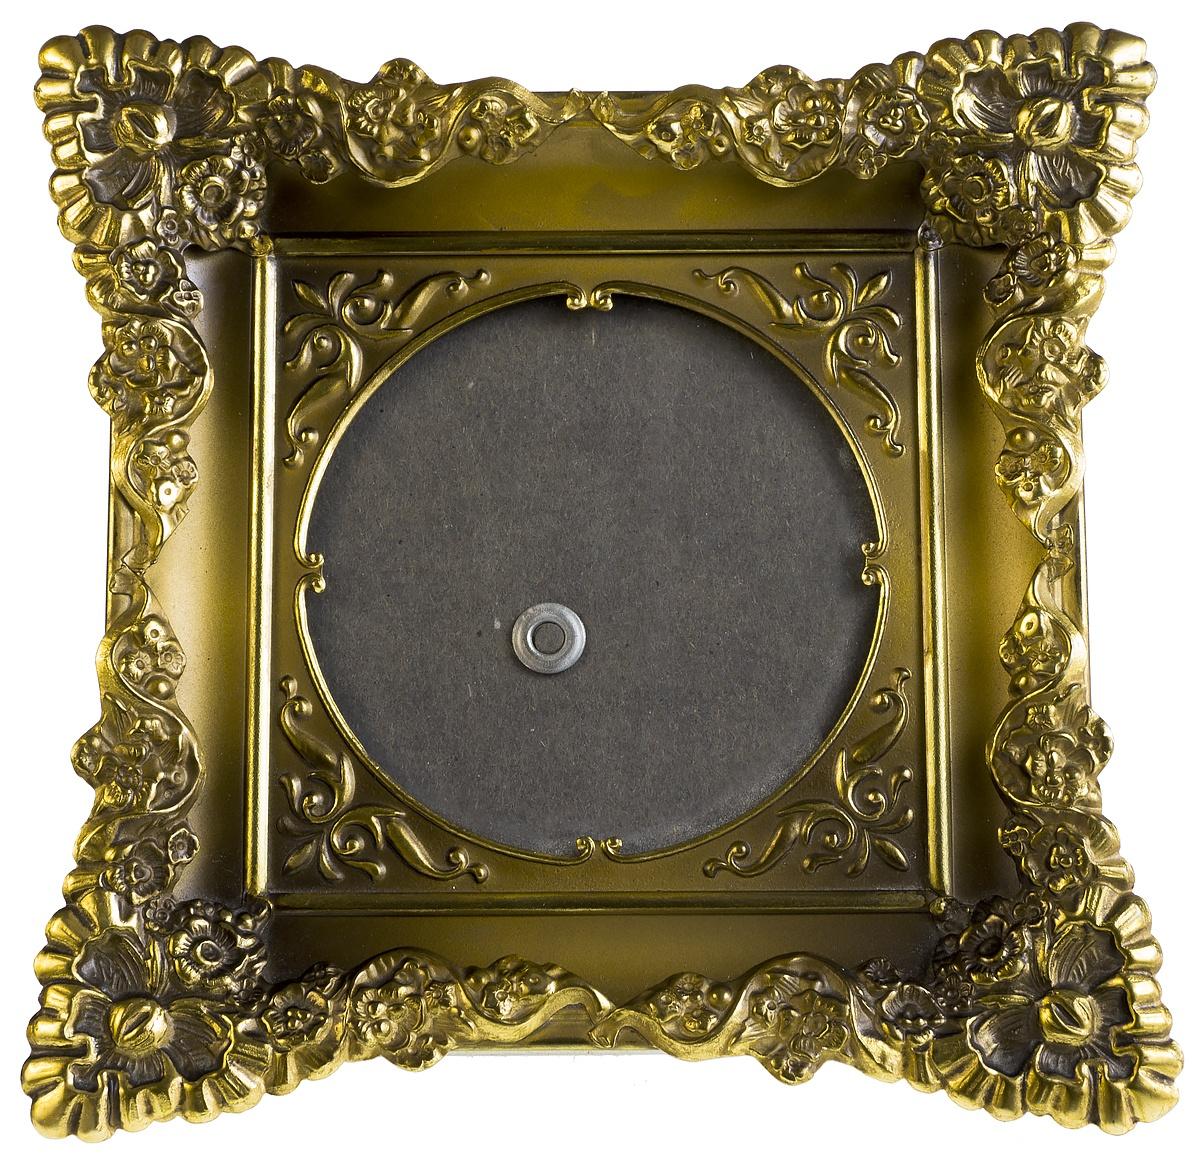 Рамка для фото в старинном стиле. Металл, стекло, пластик. Дания, конец 20 века. бижутерия 19 века фото